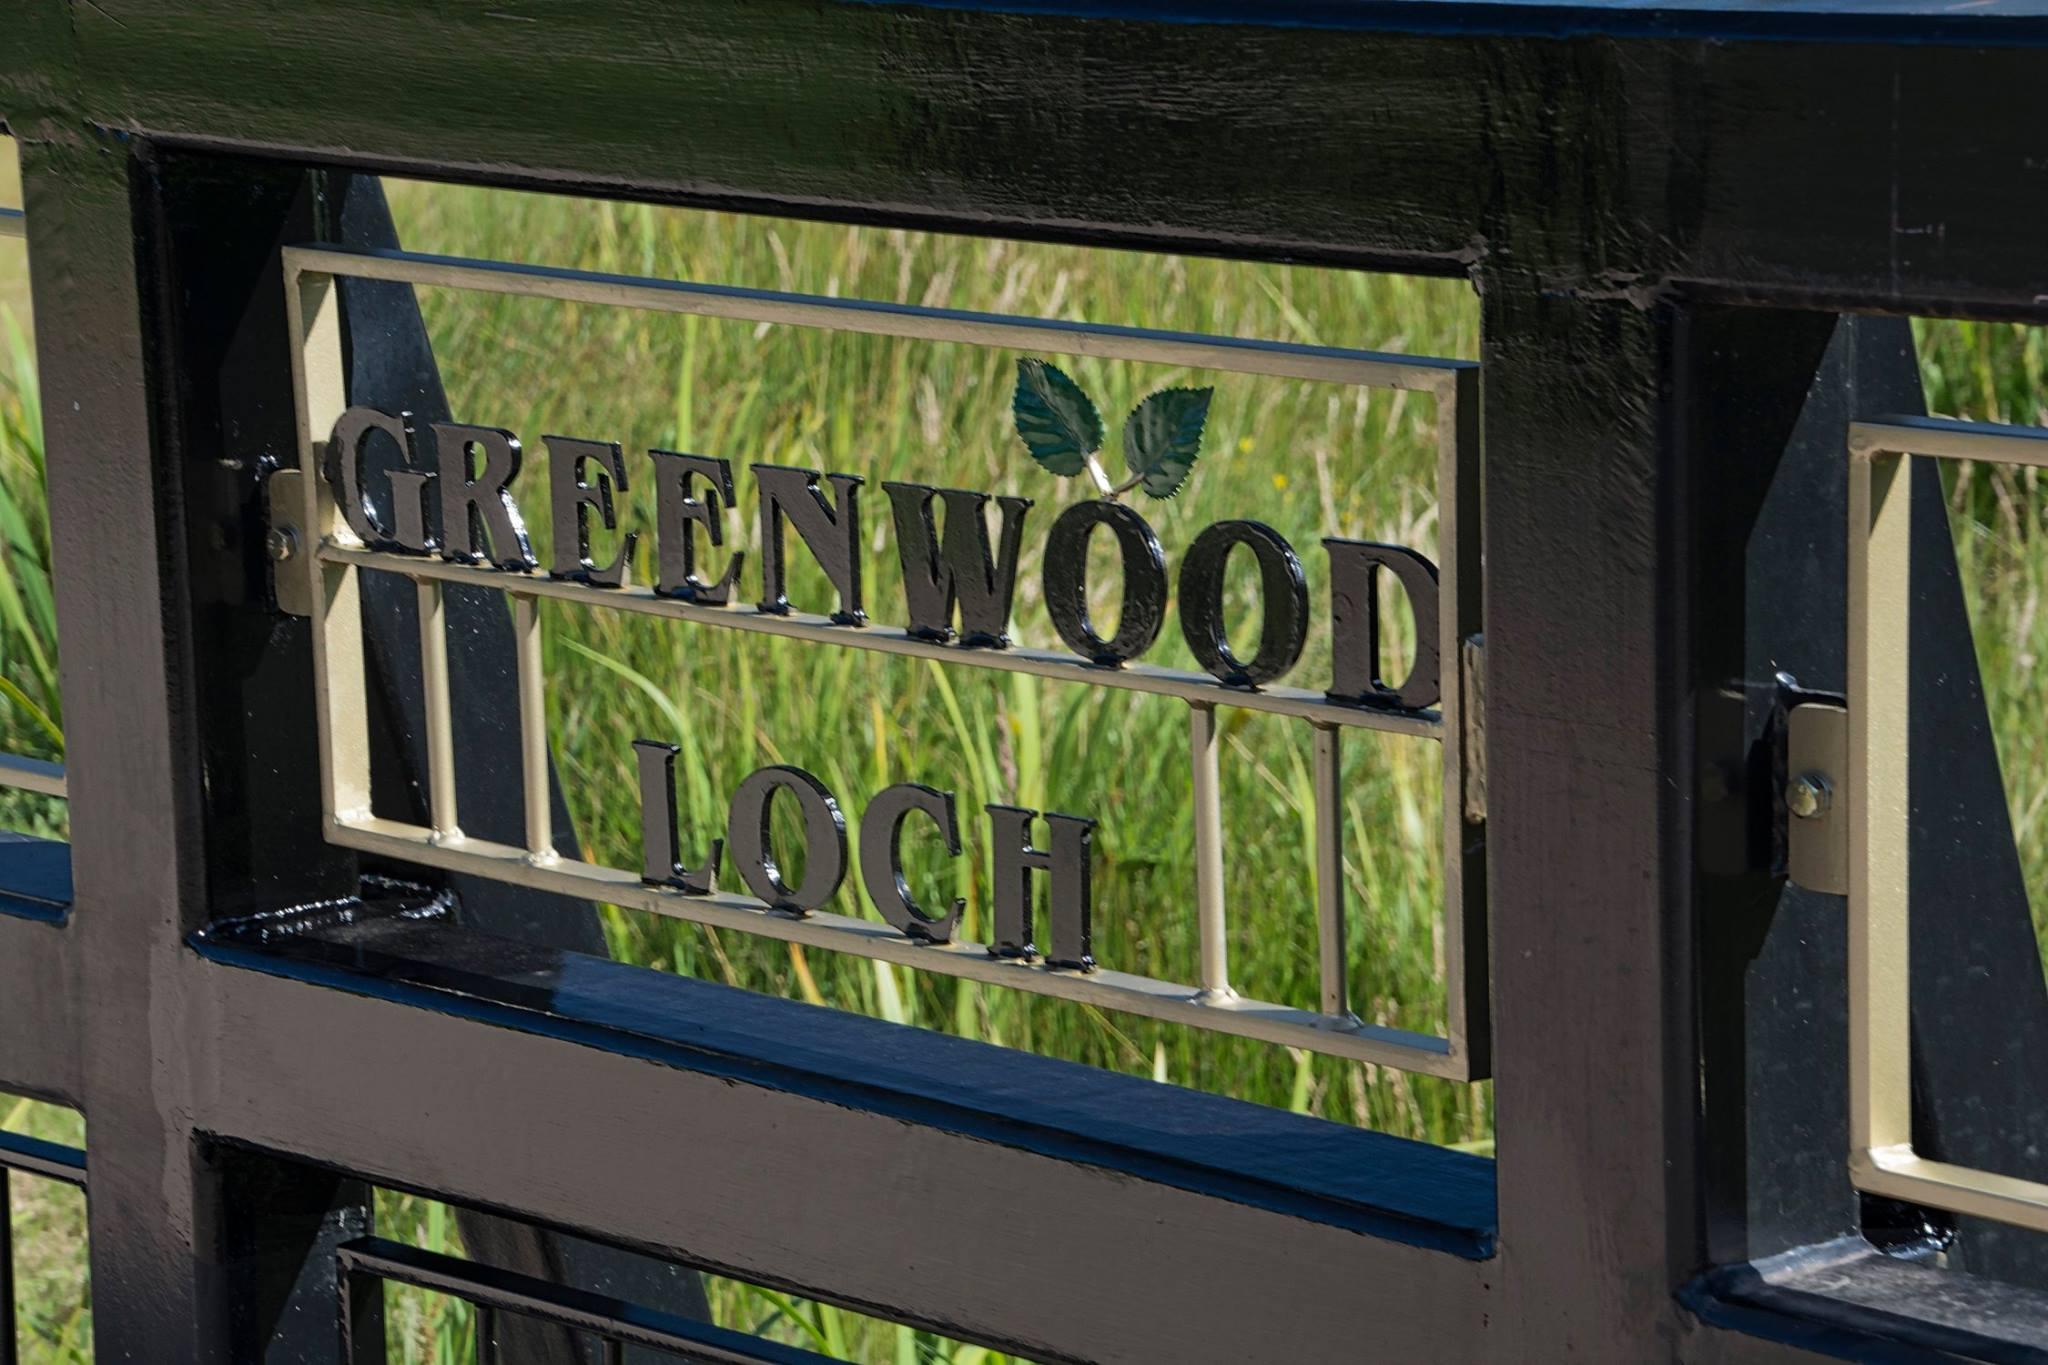 Greenwood Loch - Bridge